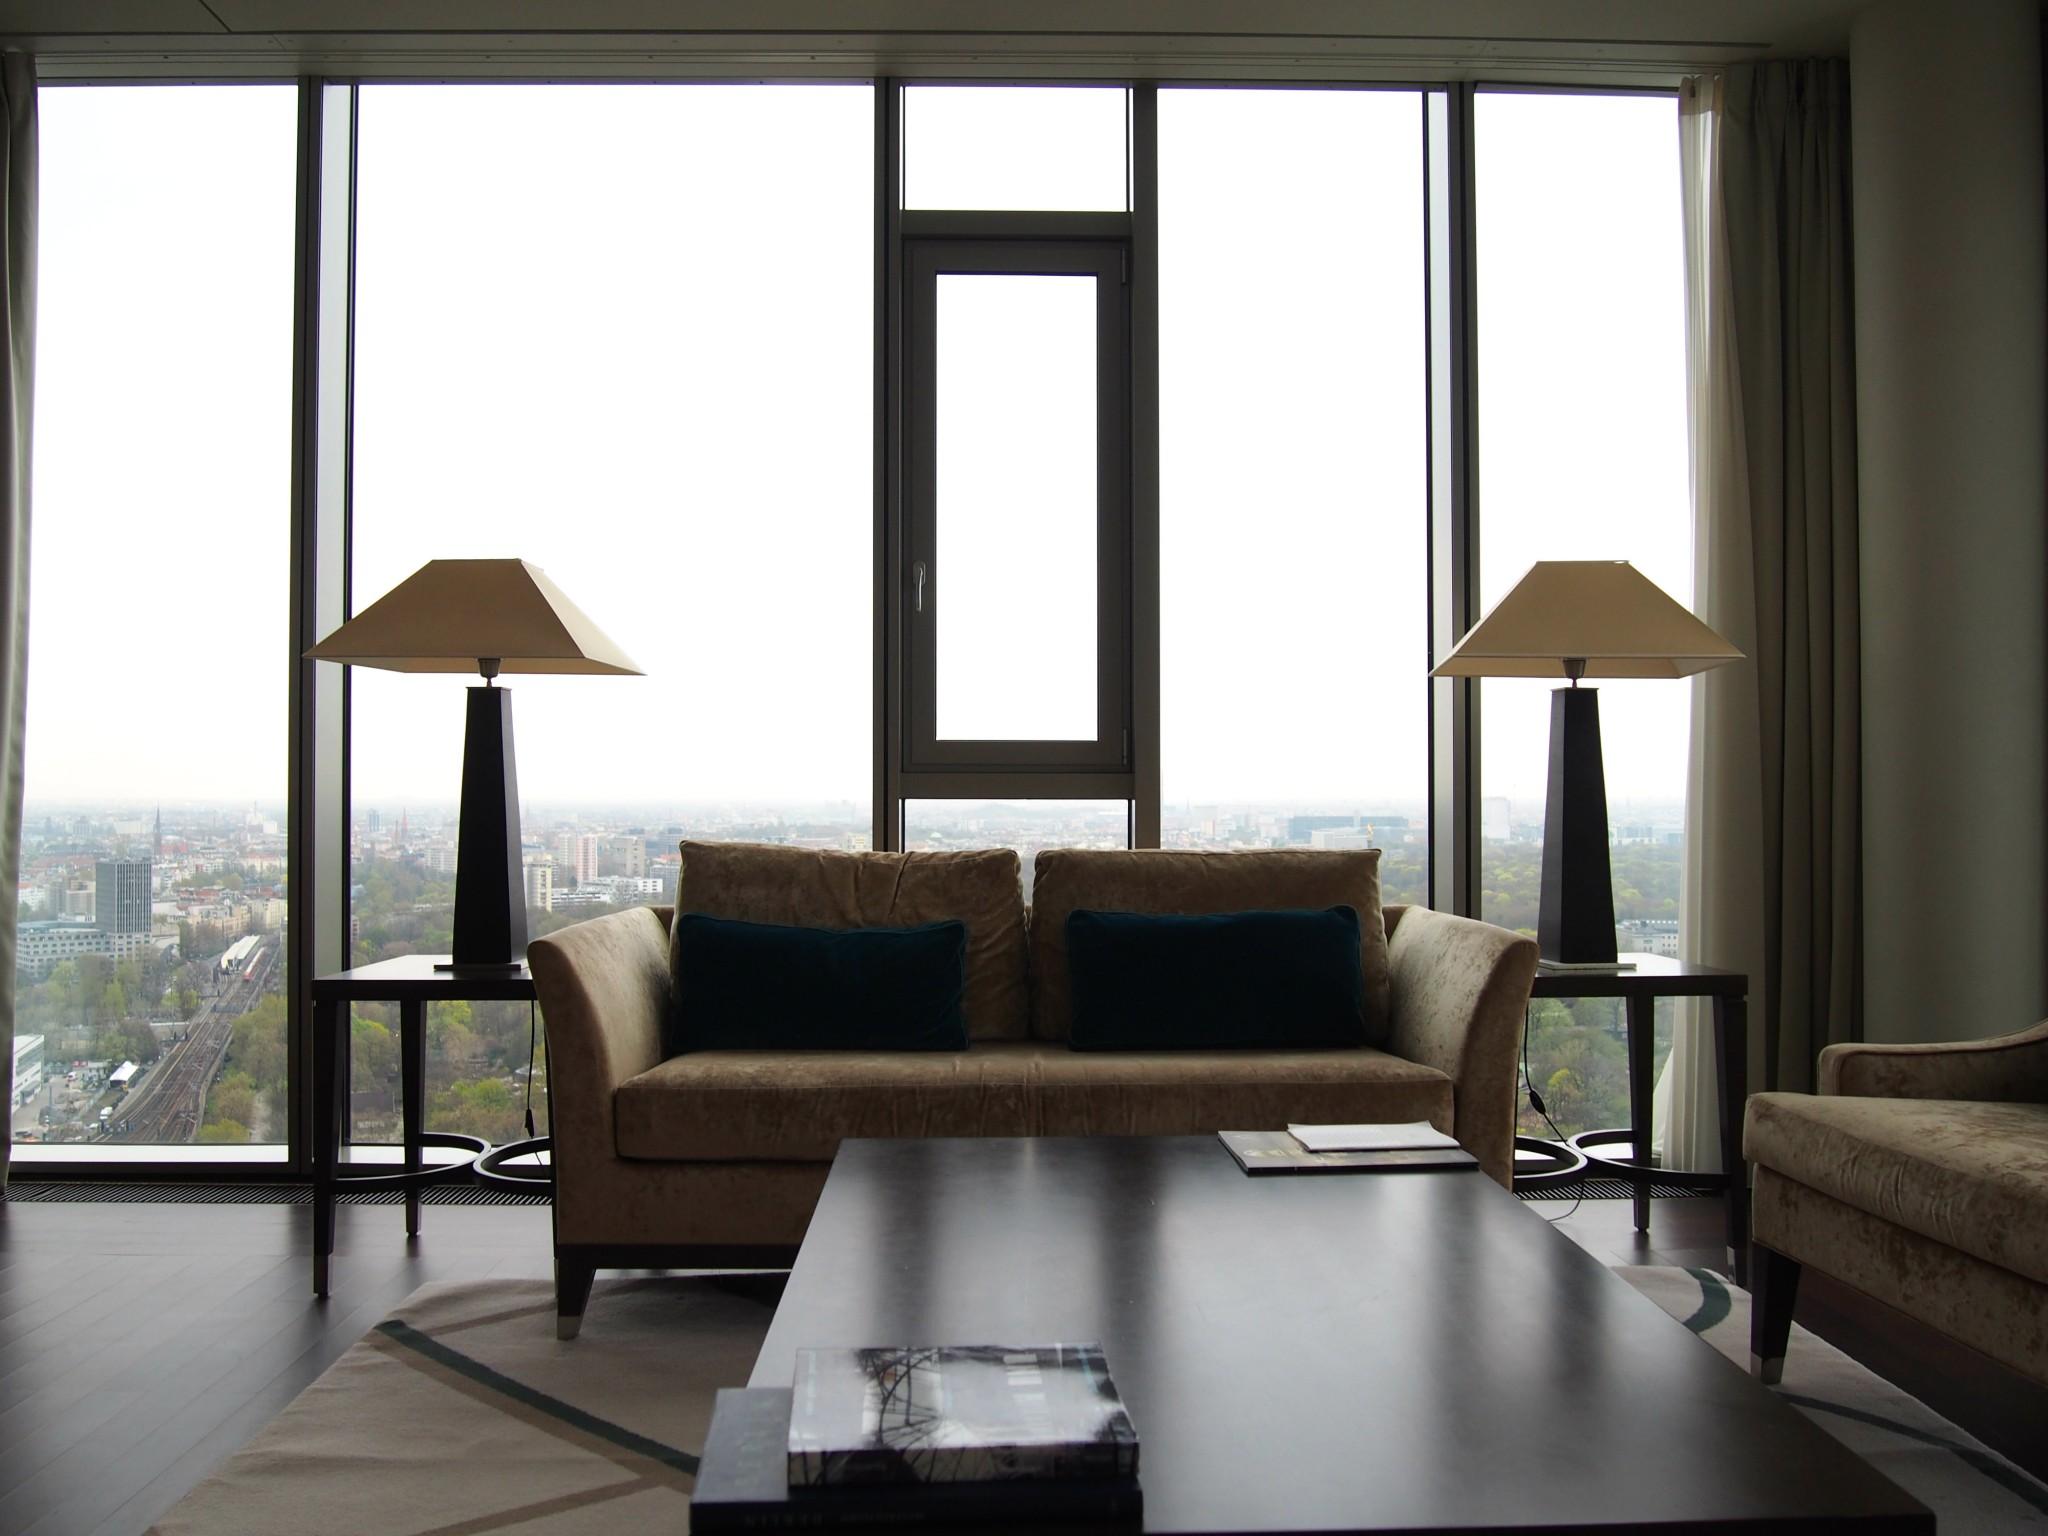 Waldorf Astoria Berlin Tower Suite olohuone 4